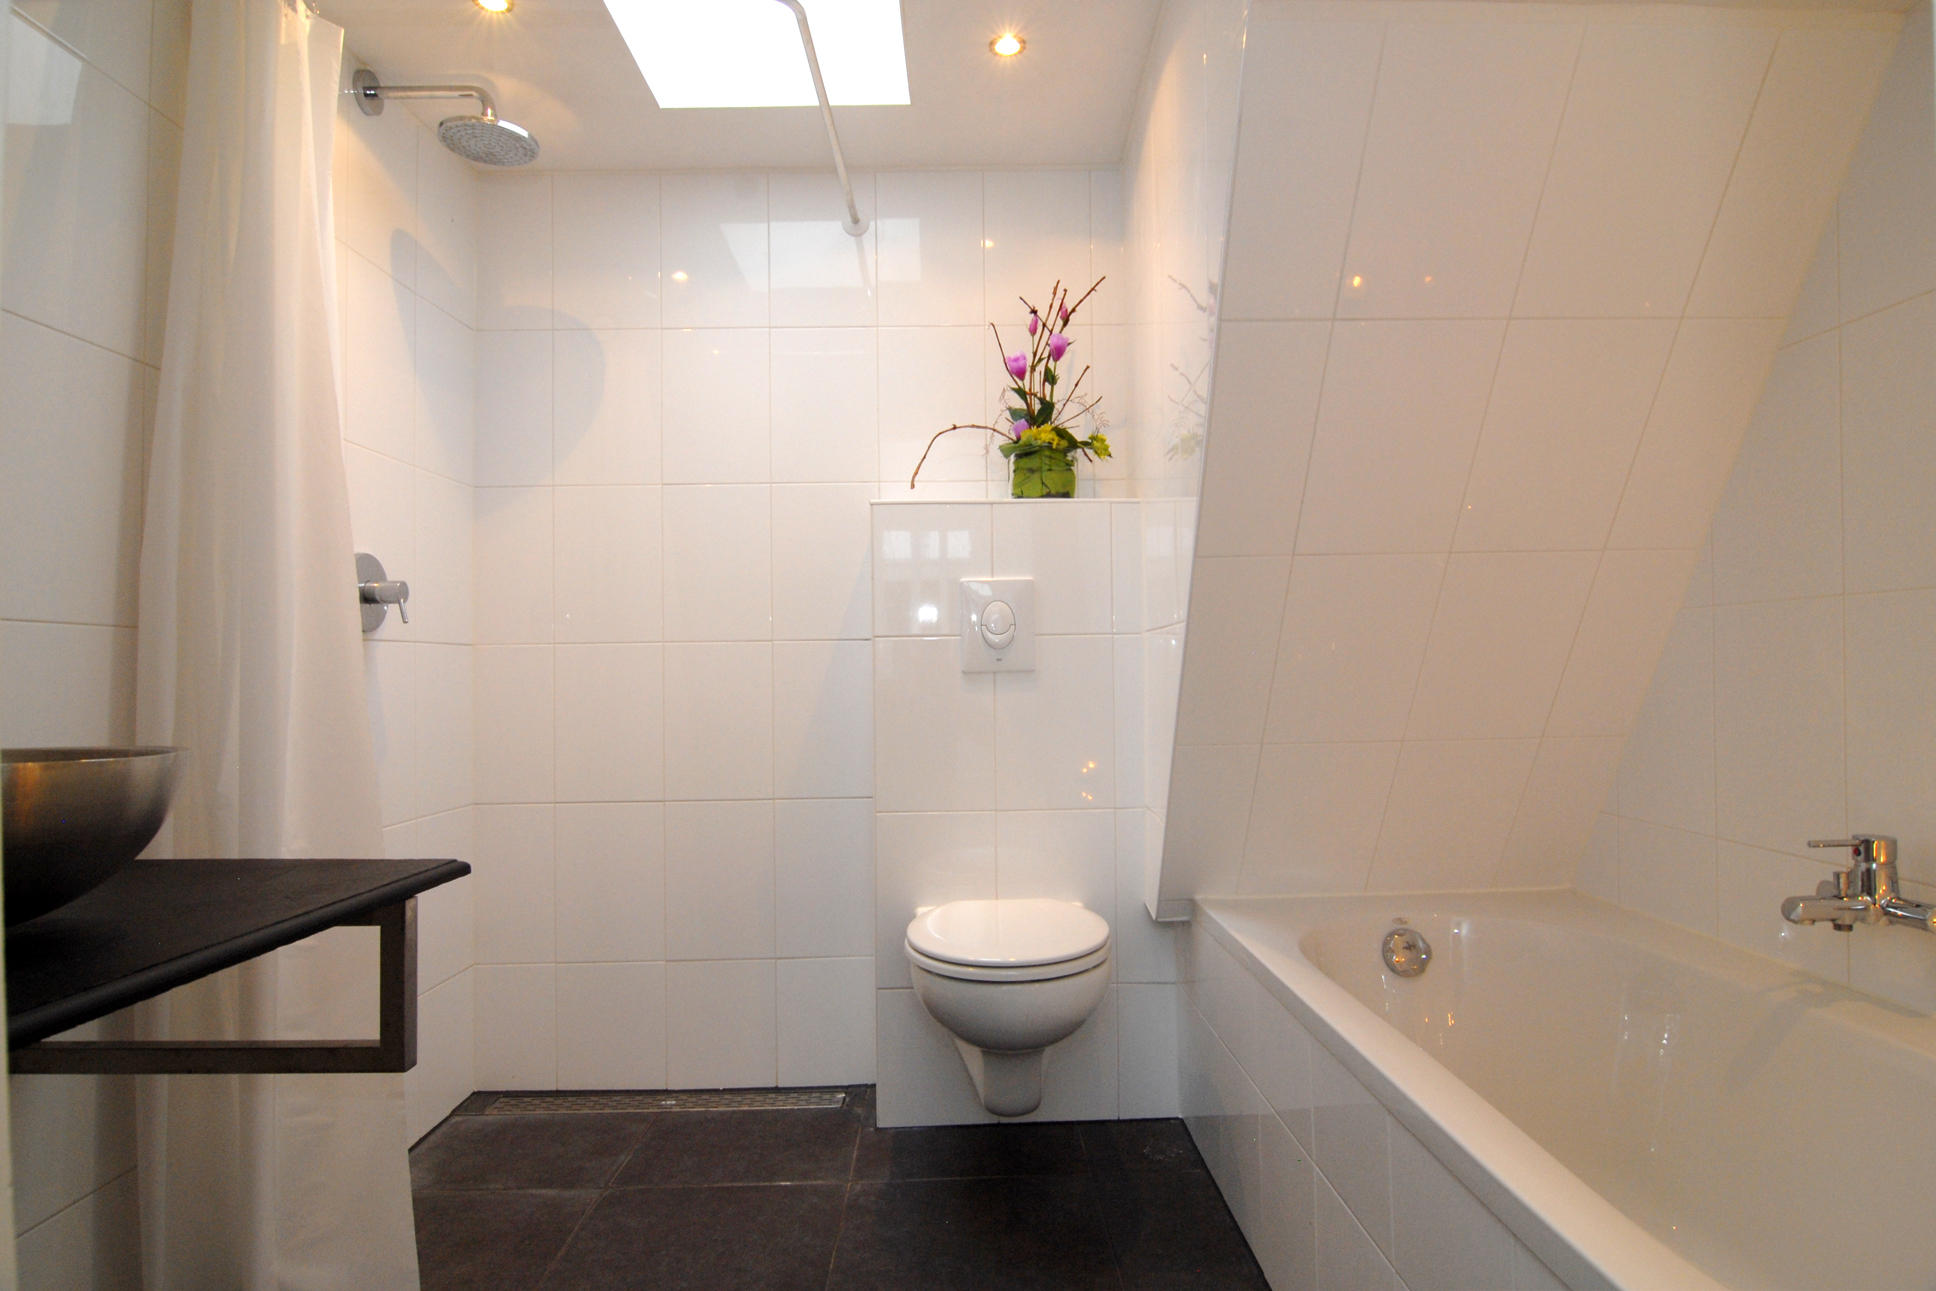 ash anbergen system haus badezimmer in twist georgsdorfer str 4. Black Bedroom Furniture Sets. Home Design Ideas